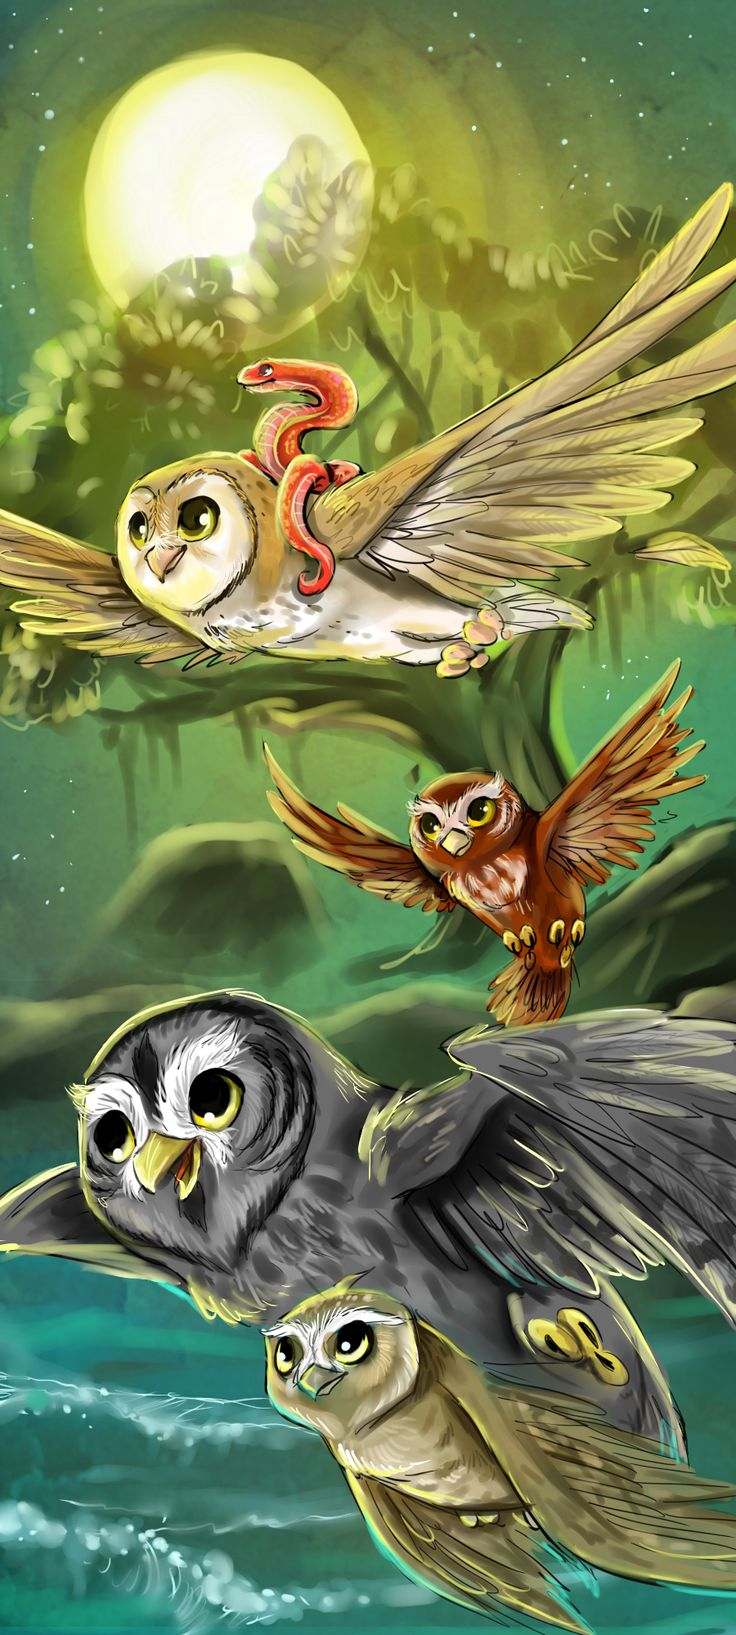 Drawn weapon guardians ga hoole Best ga'hoole Ga'Hoole ideas Pinterest